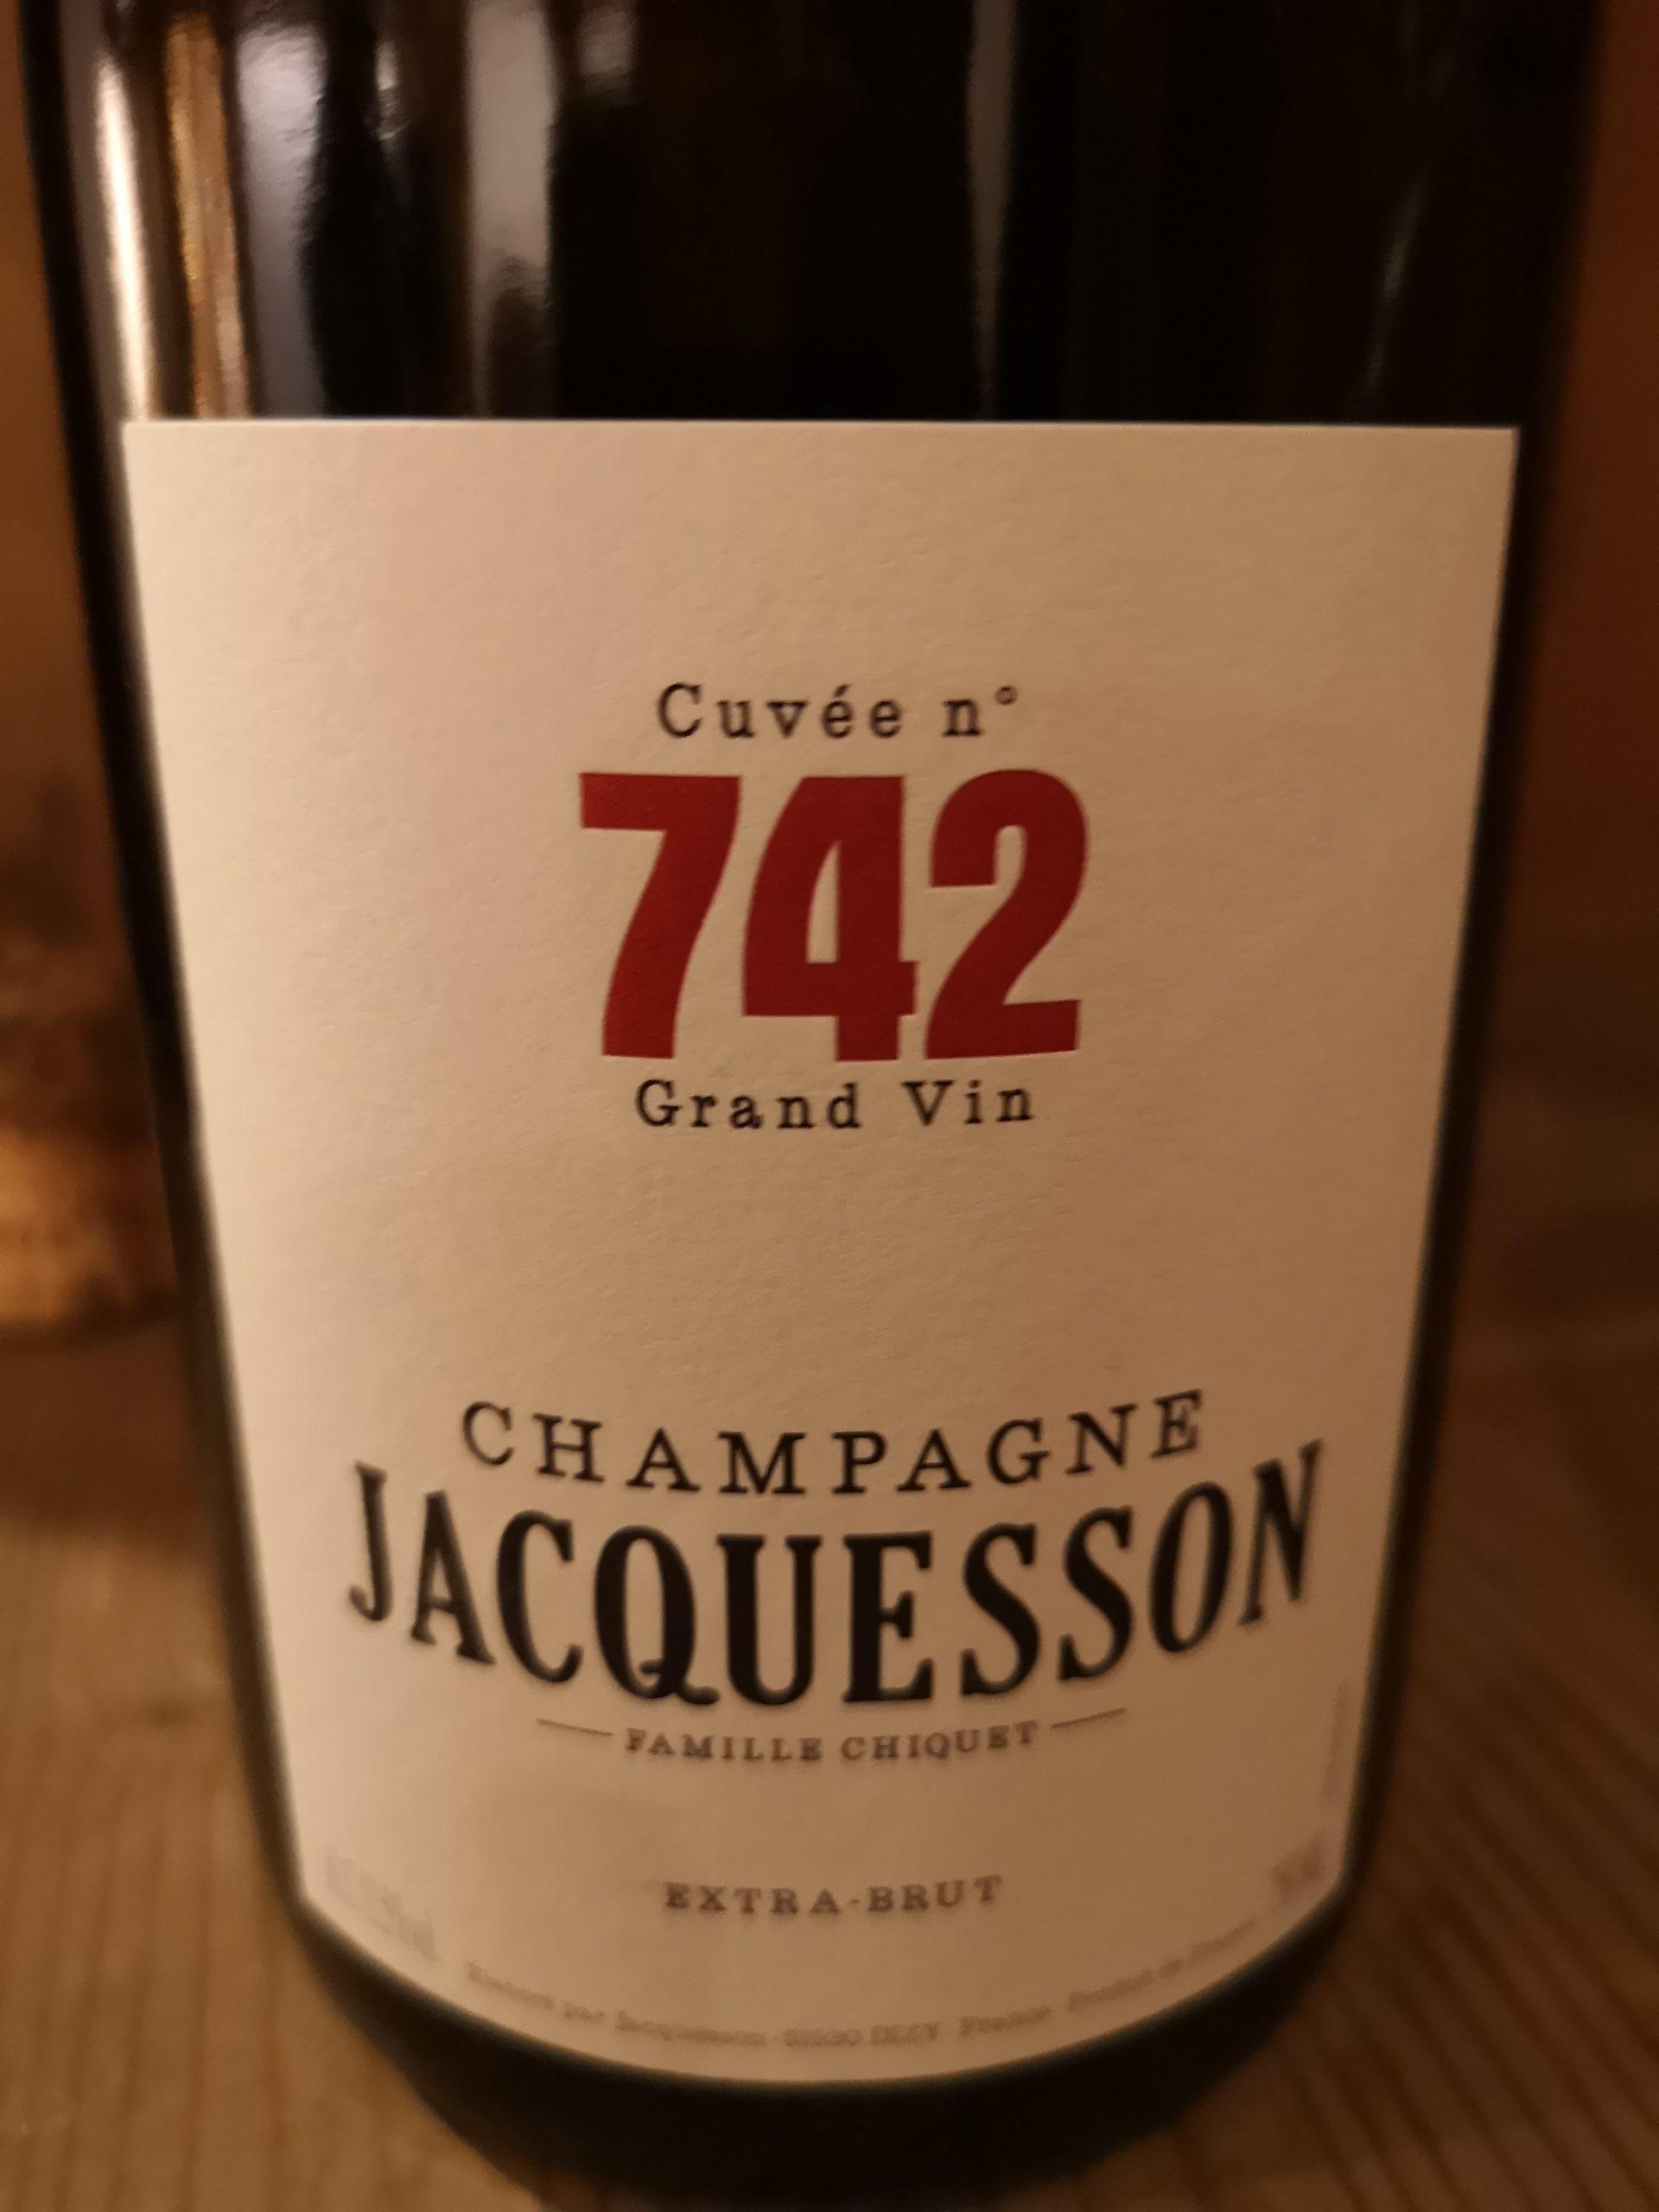 -nv- Champagne Jacquesson Cuvée n° 742 Extra-Brut   Jacquesson